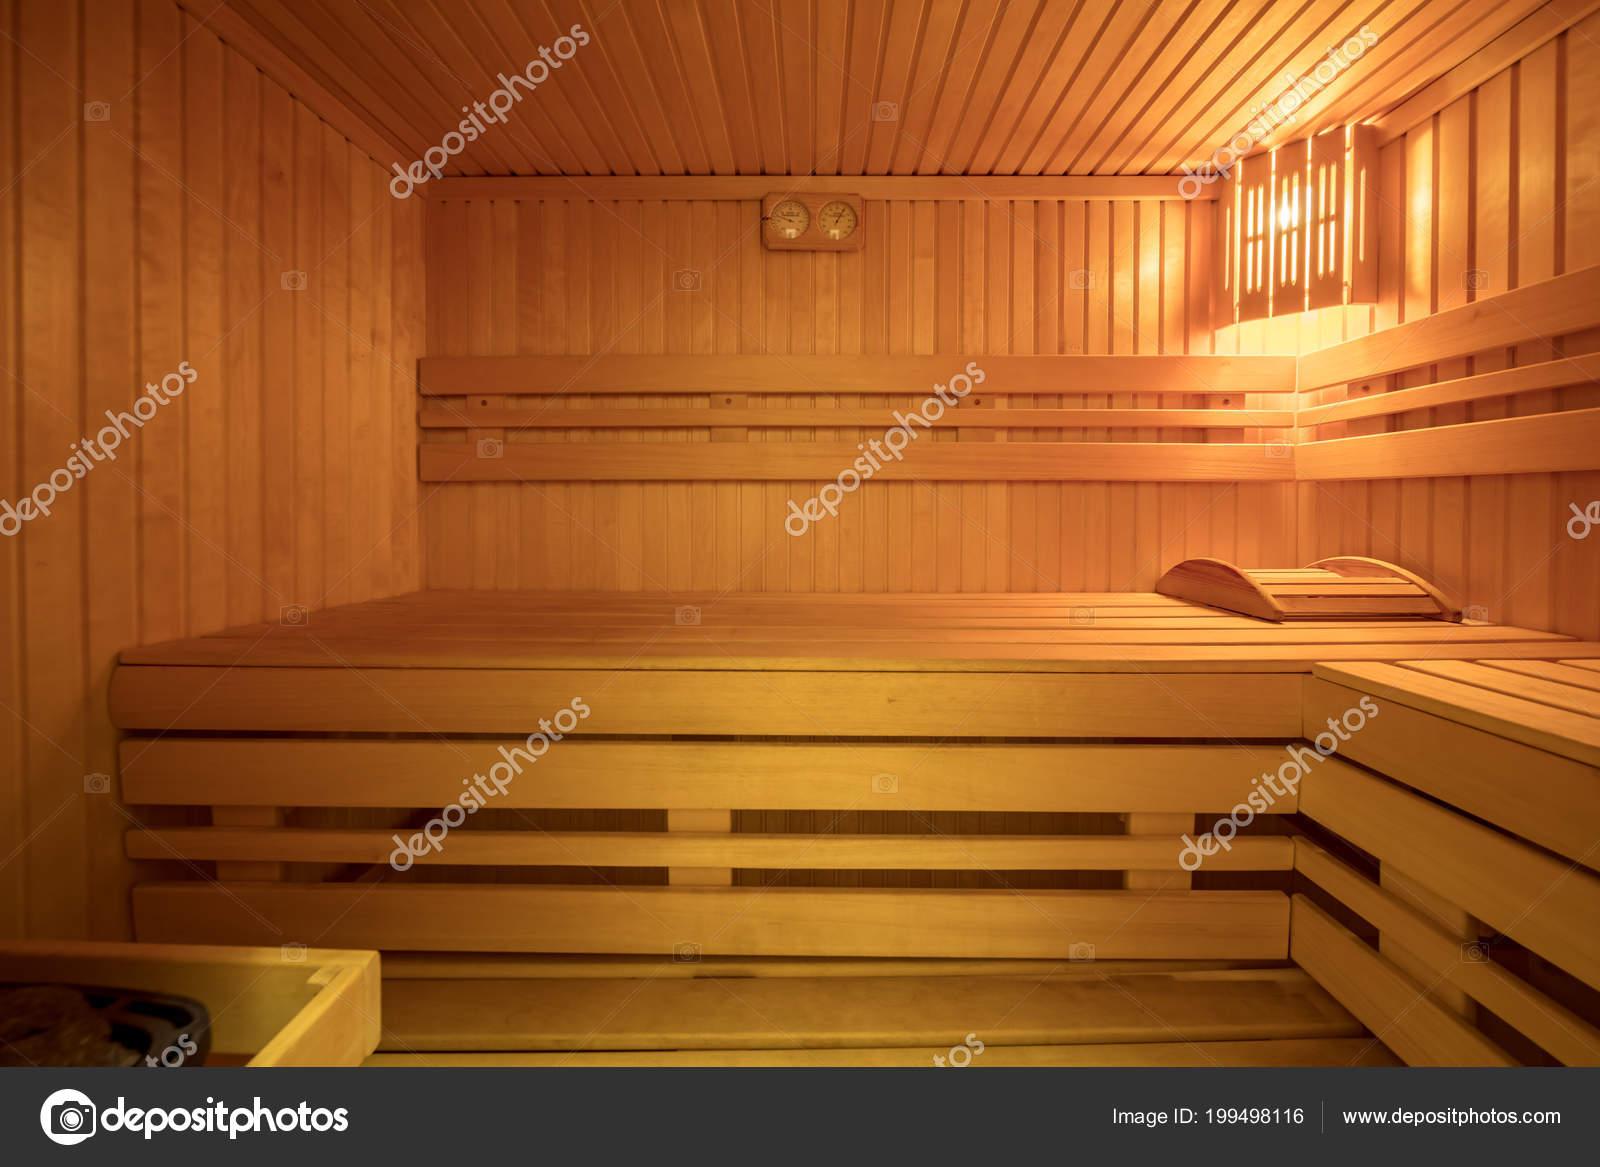 bain chaleur finlandaise int rieur salle sauna bois naturel photographie olgasweet 199498116. Black Bedroom Furniture Sets. Home Design Ideas